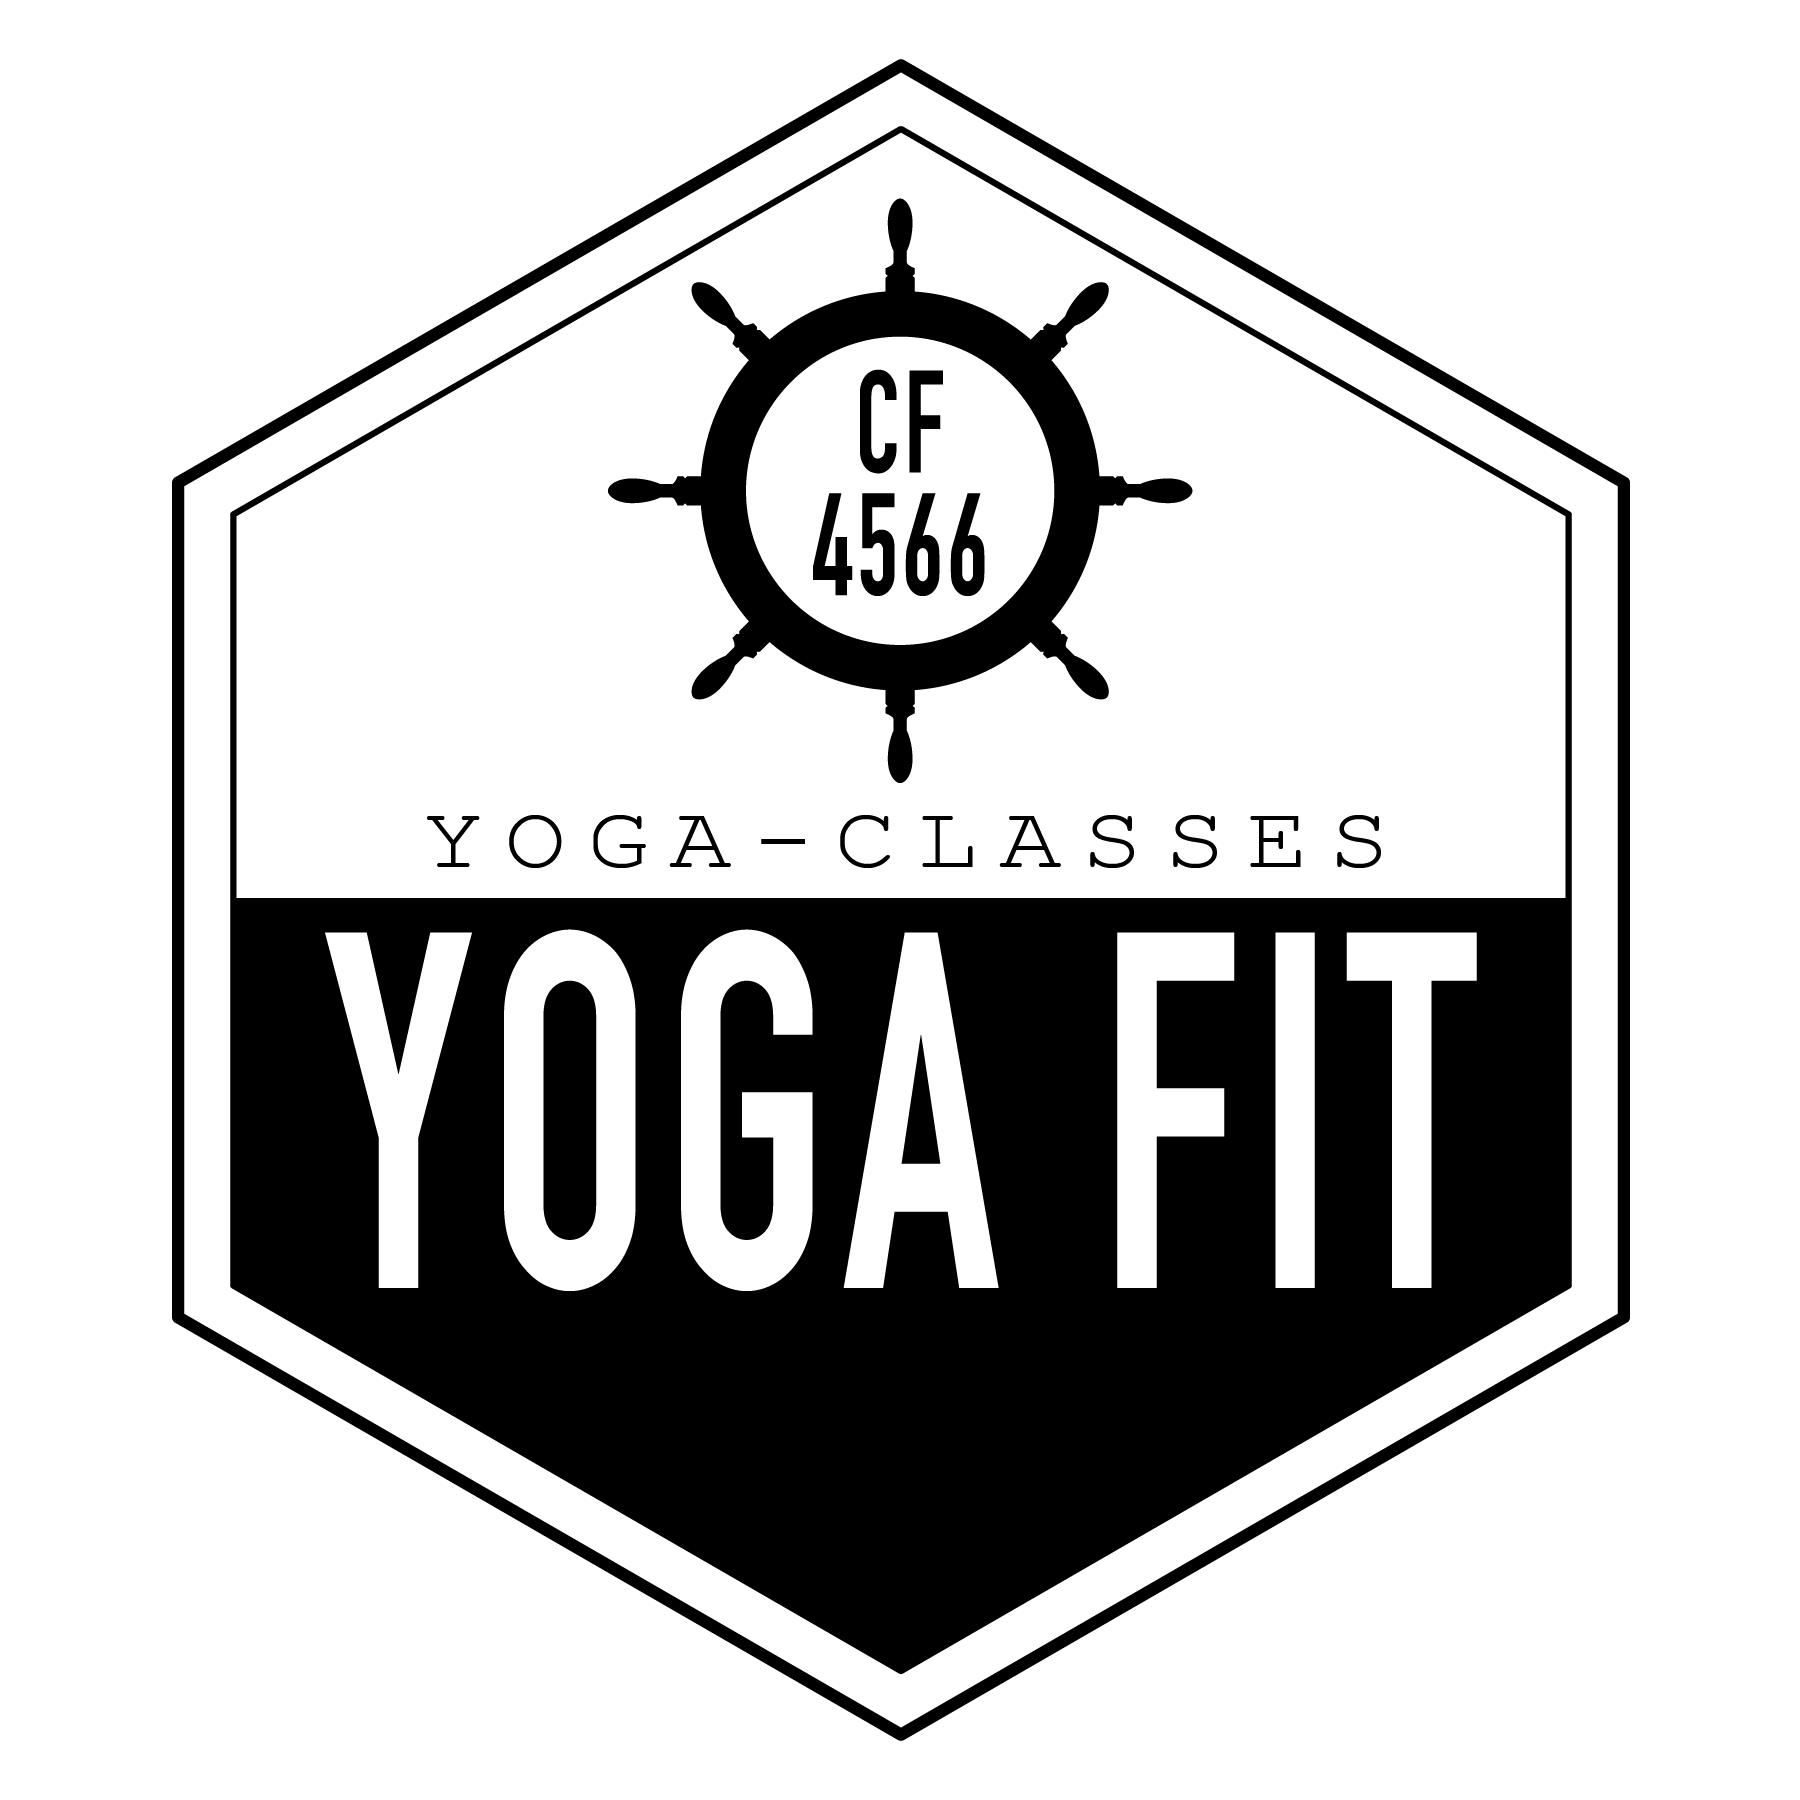 CrossFit 4566 Yoga Classes